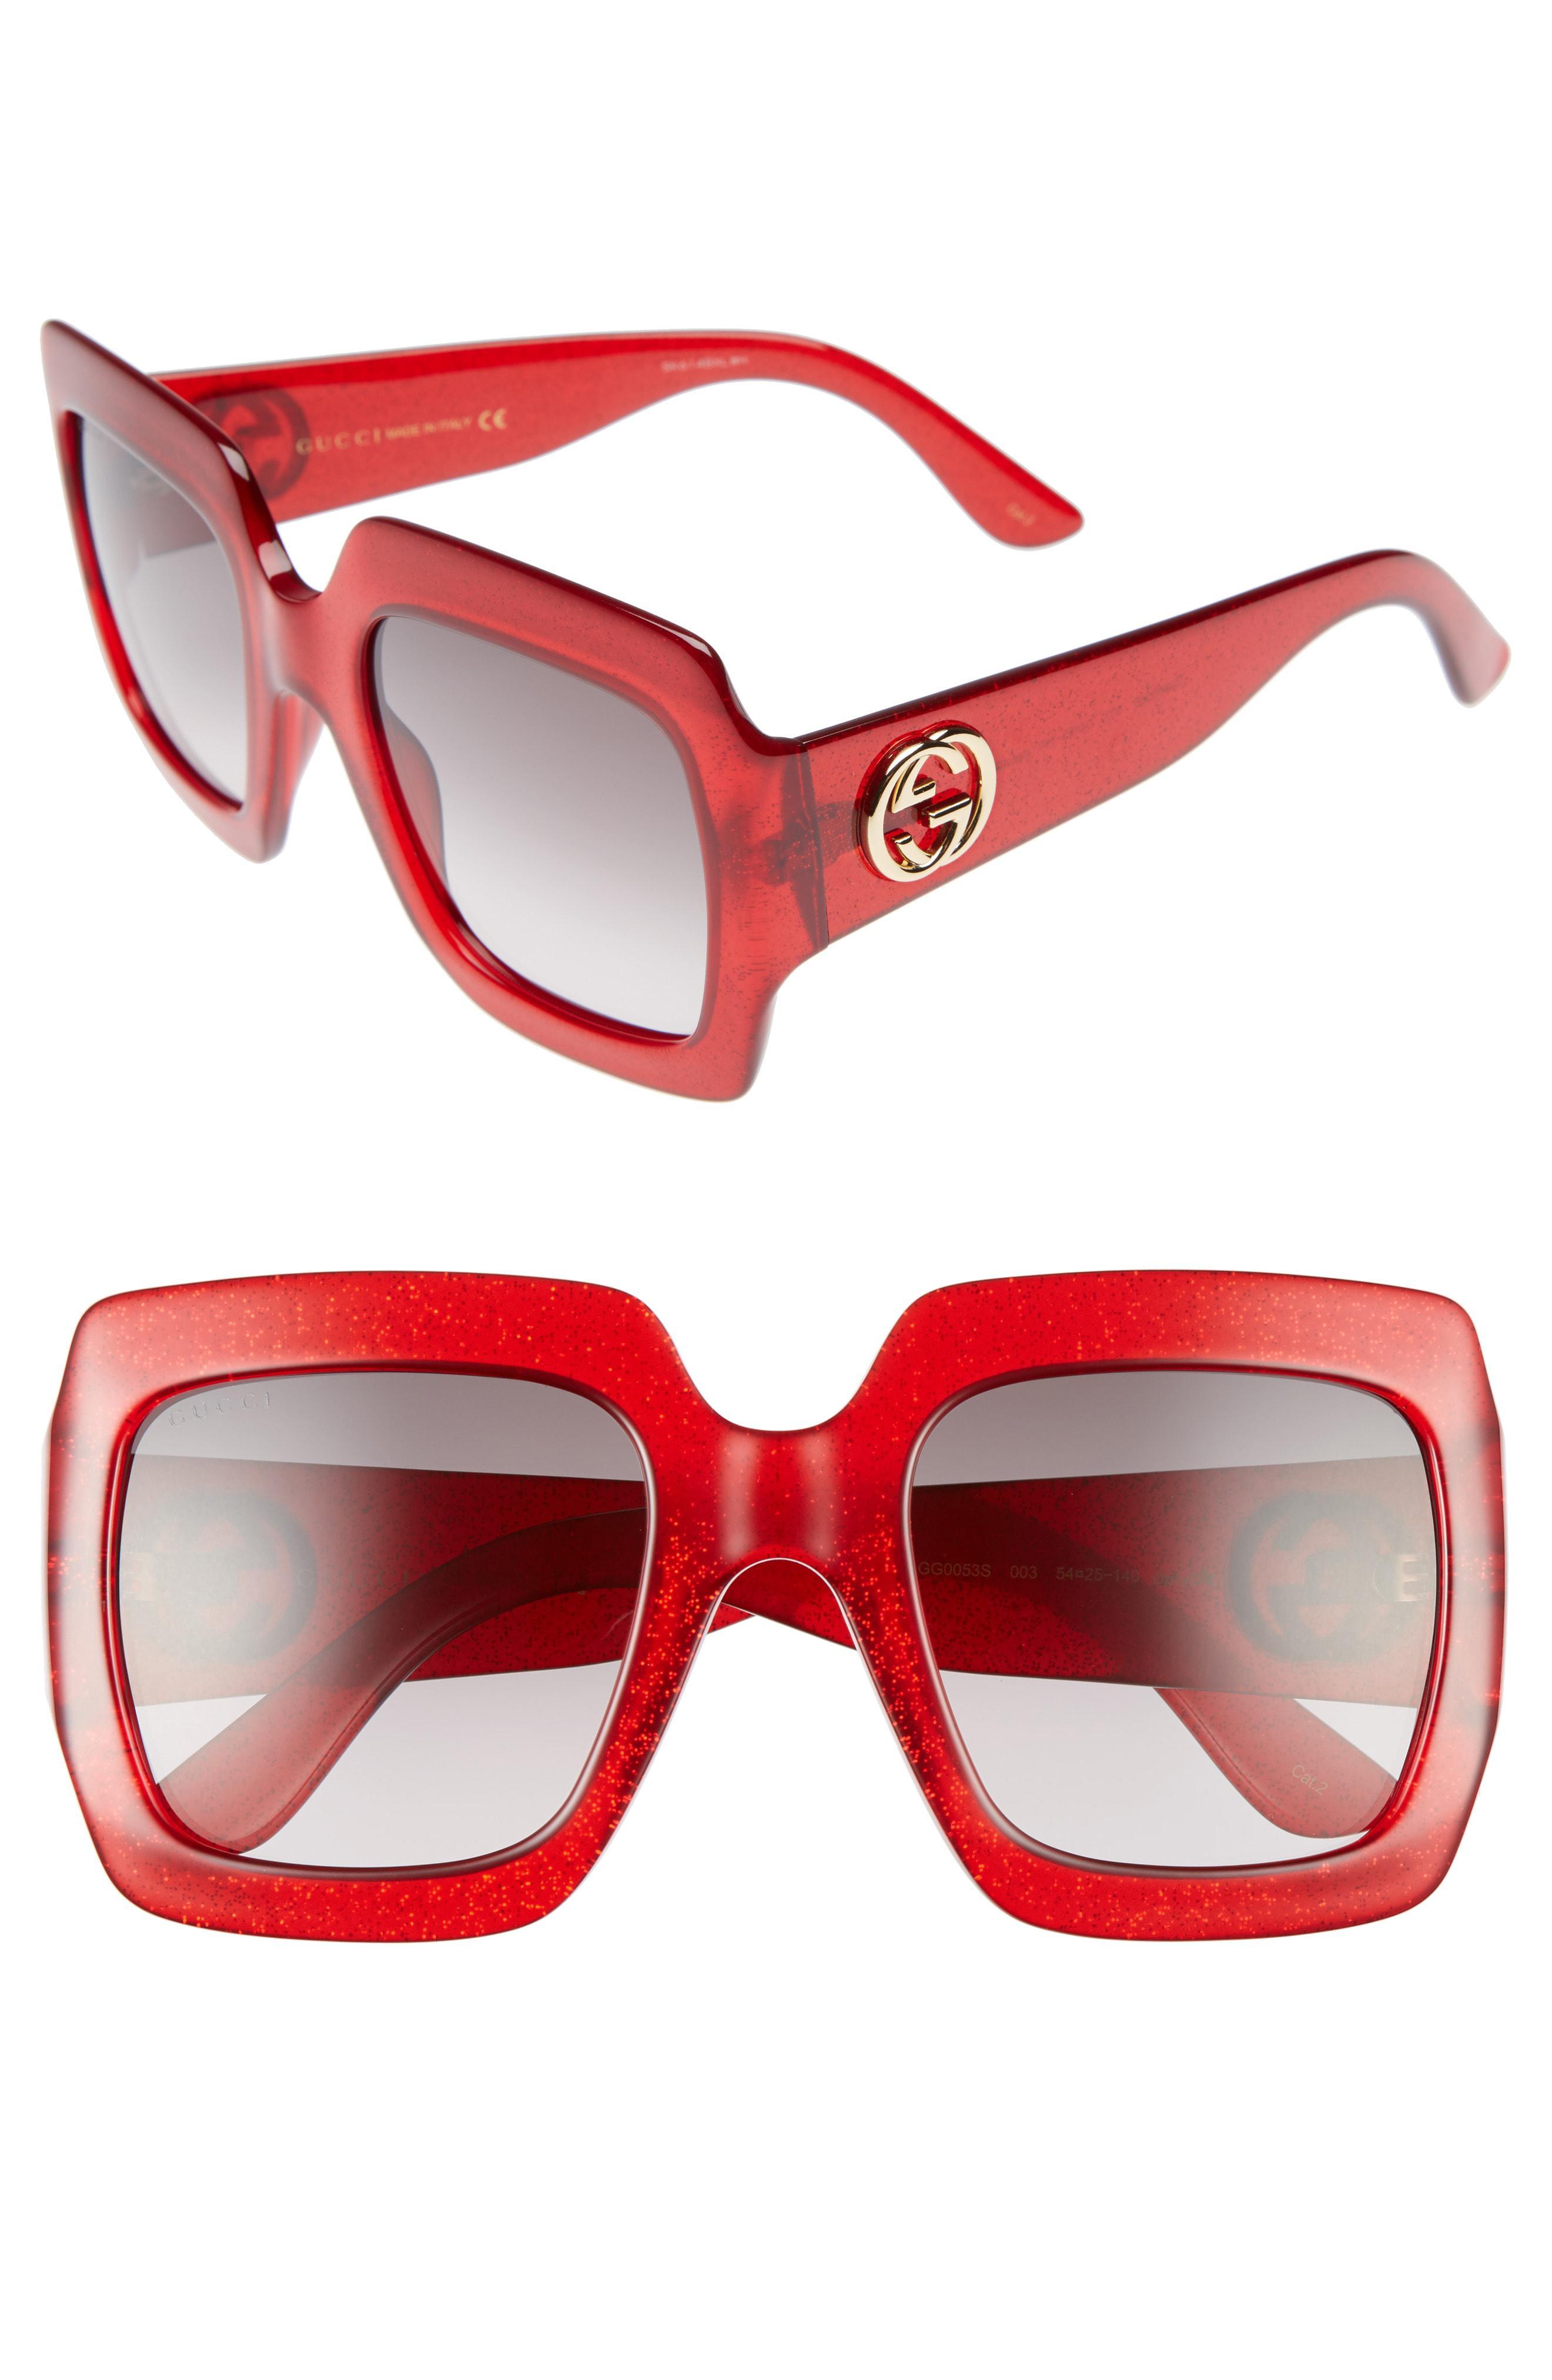 54579df5d4b Lyst - Gucci 54mm Square Sunglasses in Red